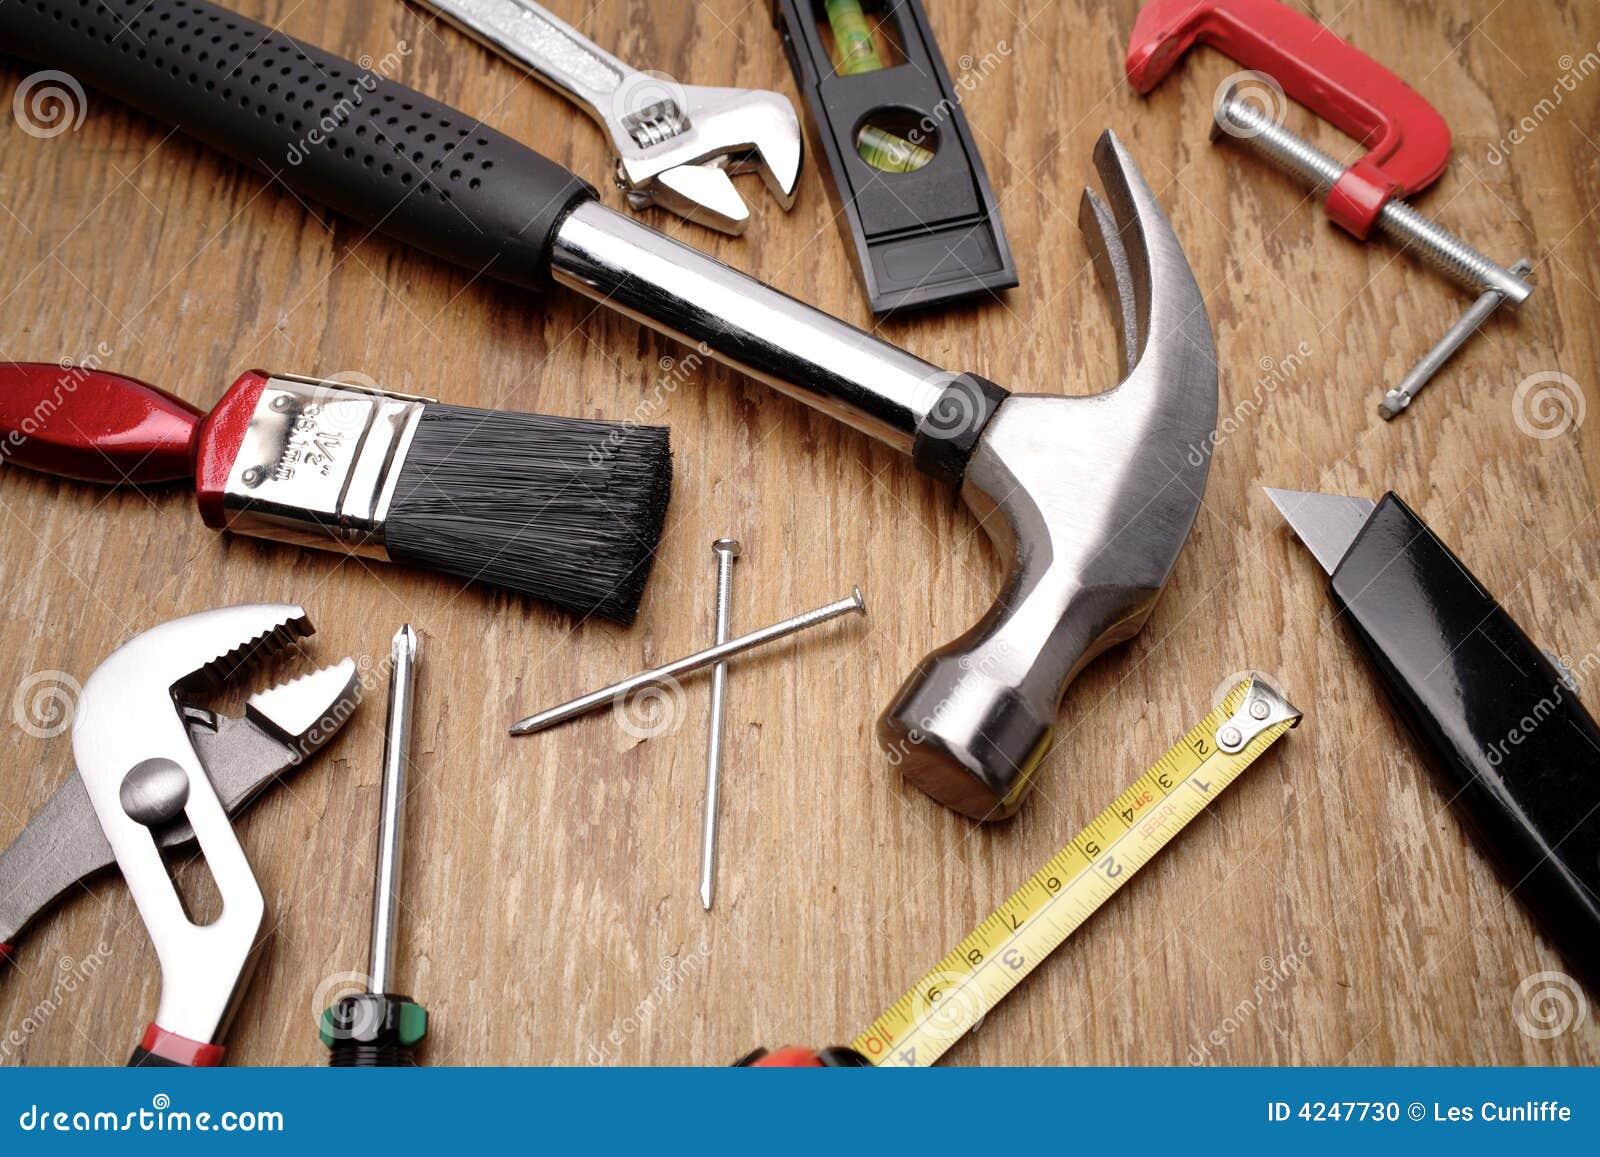 Tools On Wood Background Stock Photo Image Of Knife Closeup 4247730